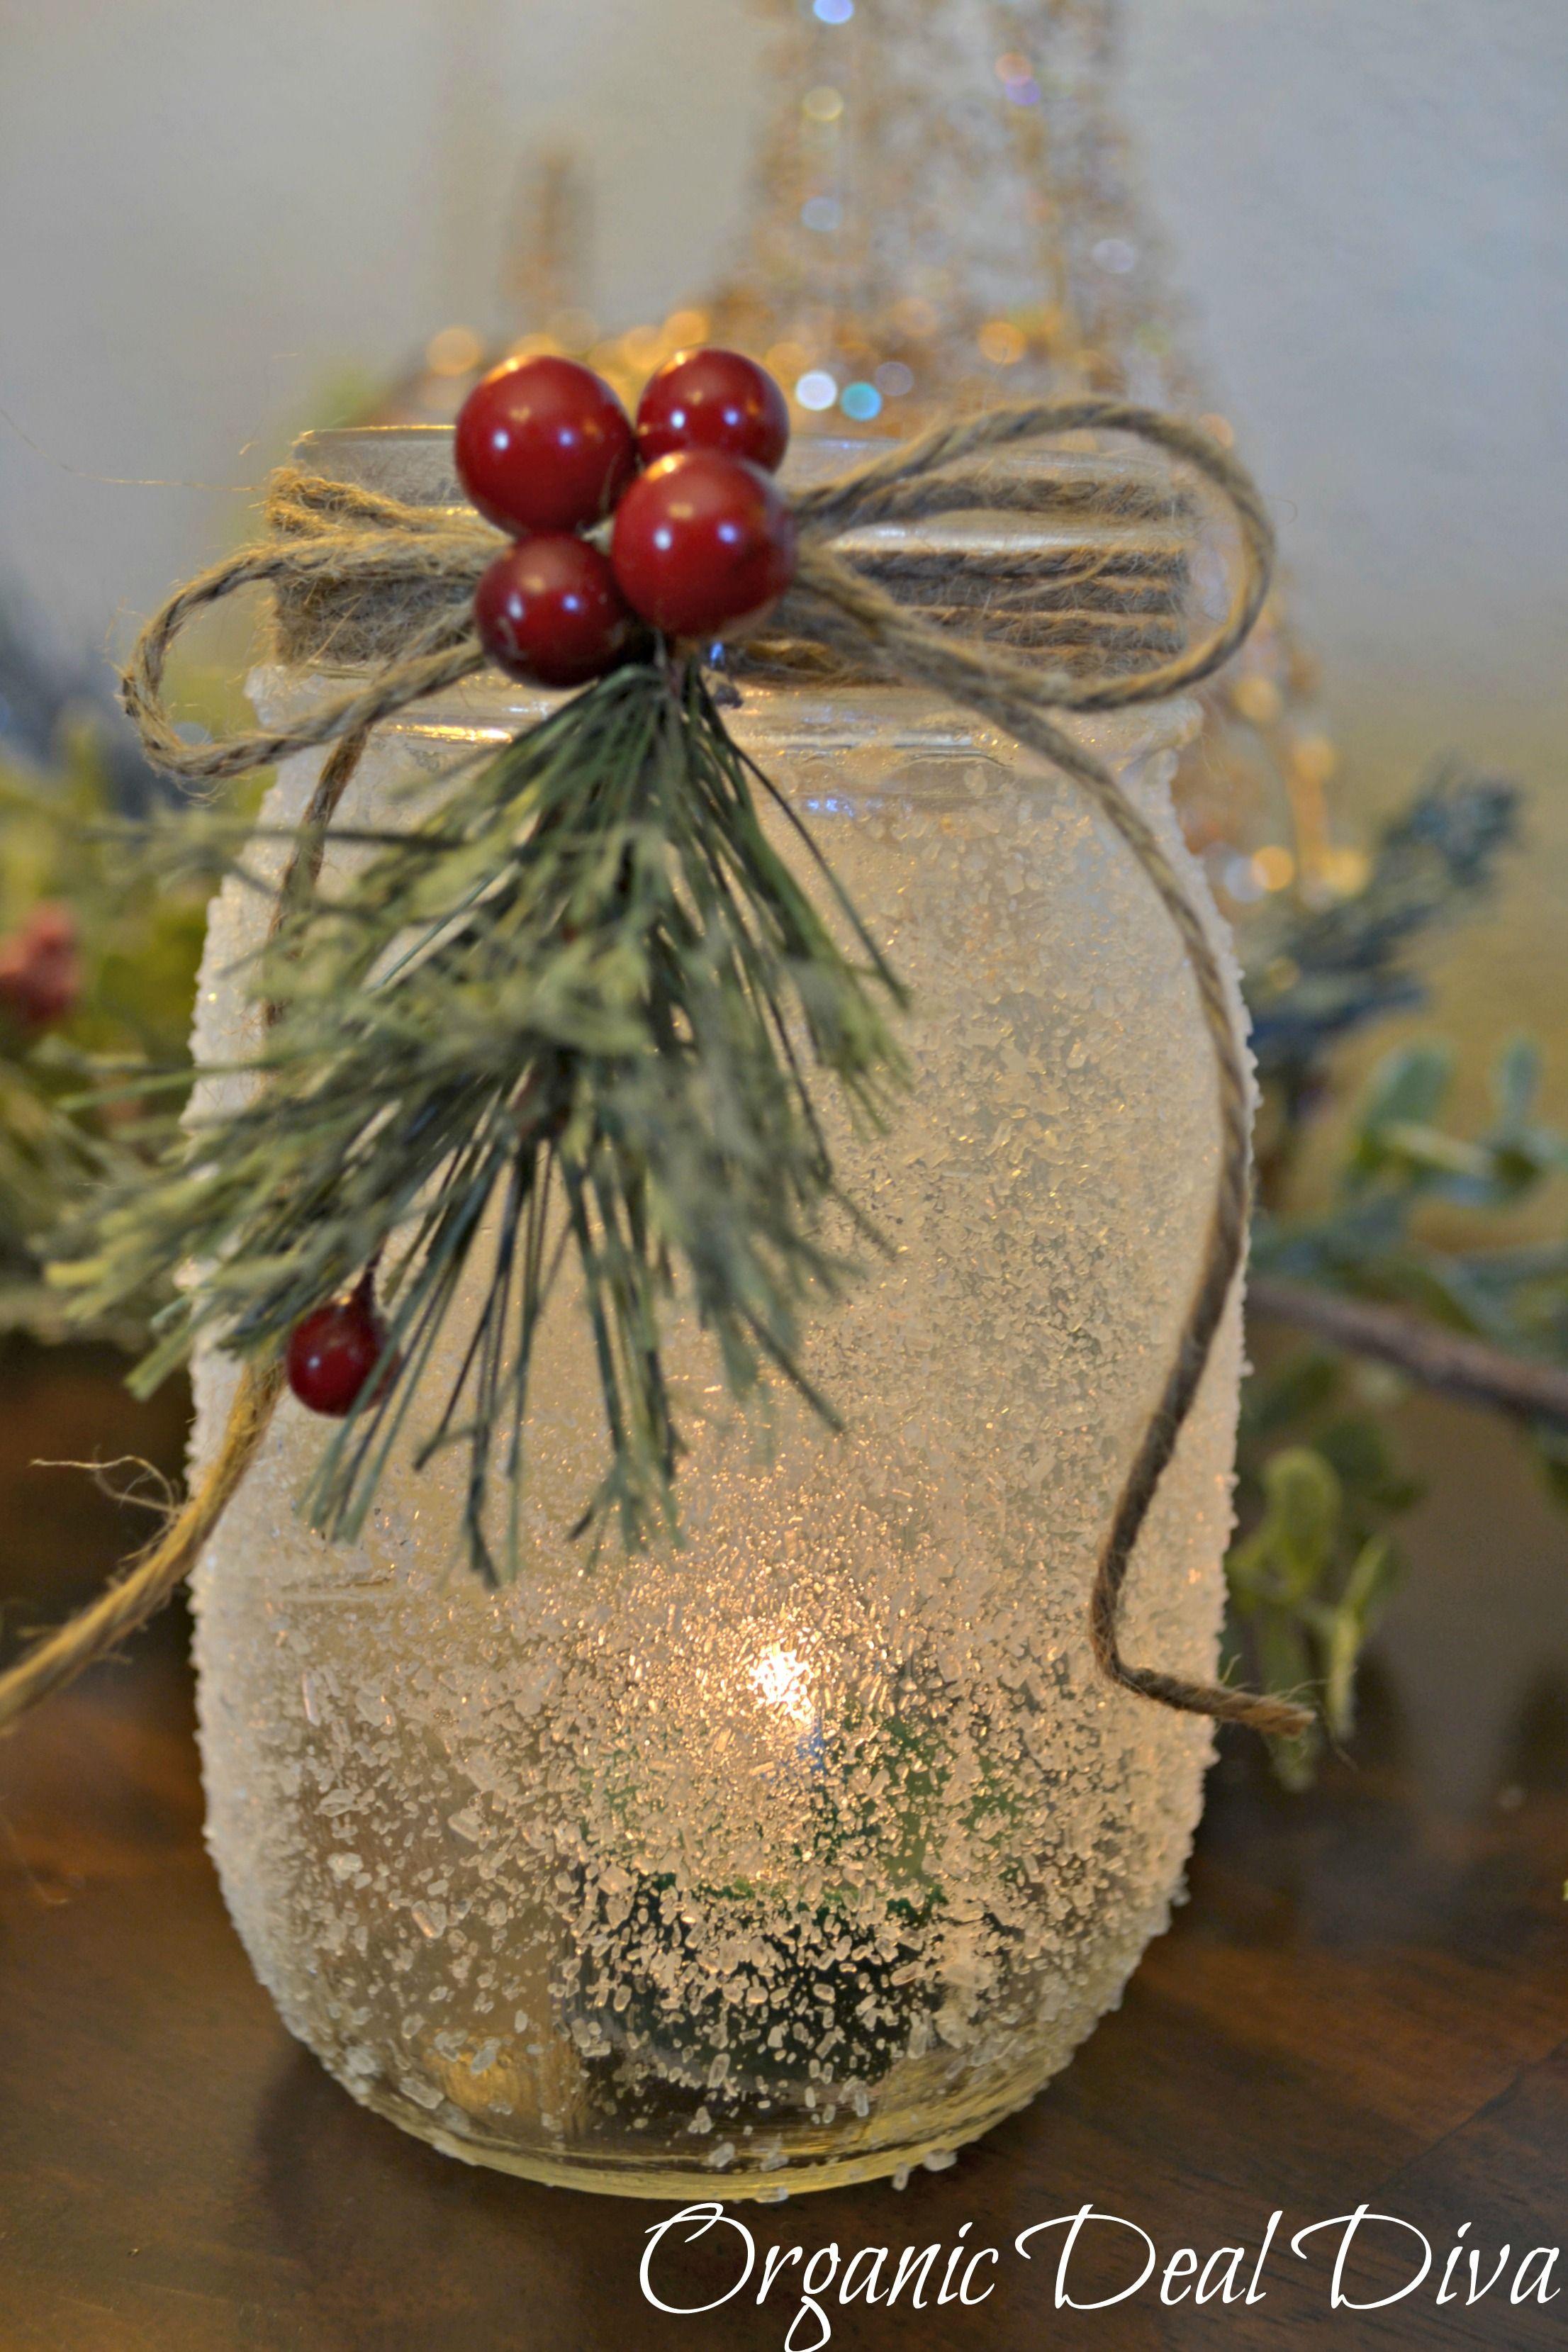 Diy snow covered mason jar candle holders easy diy for Mason jar candle crafts